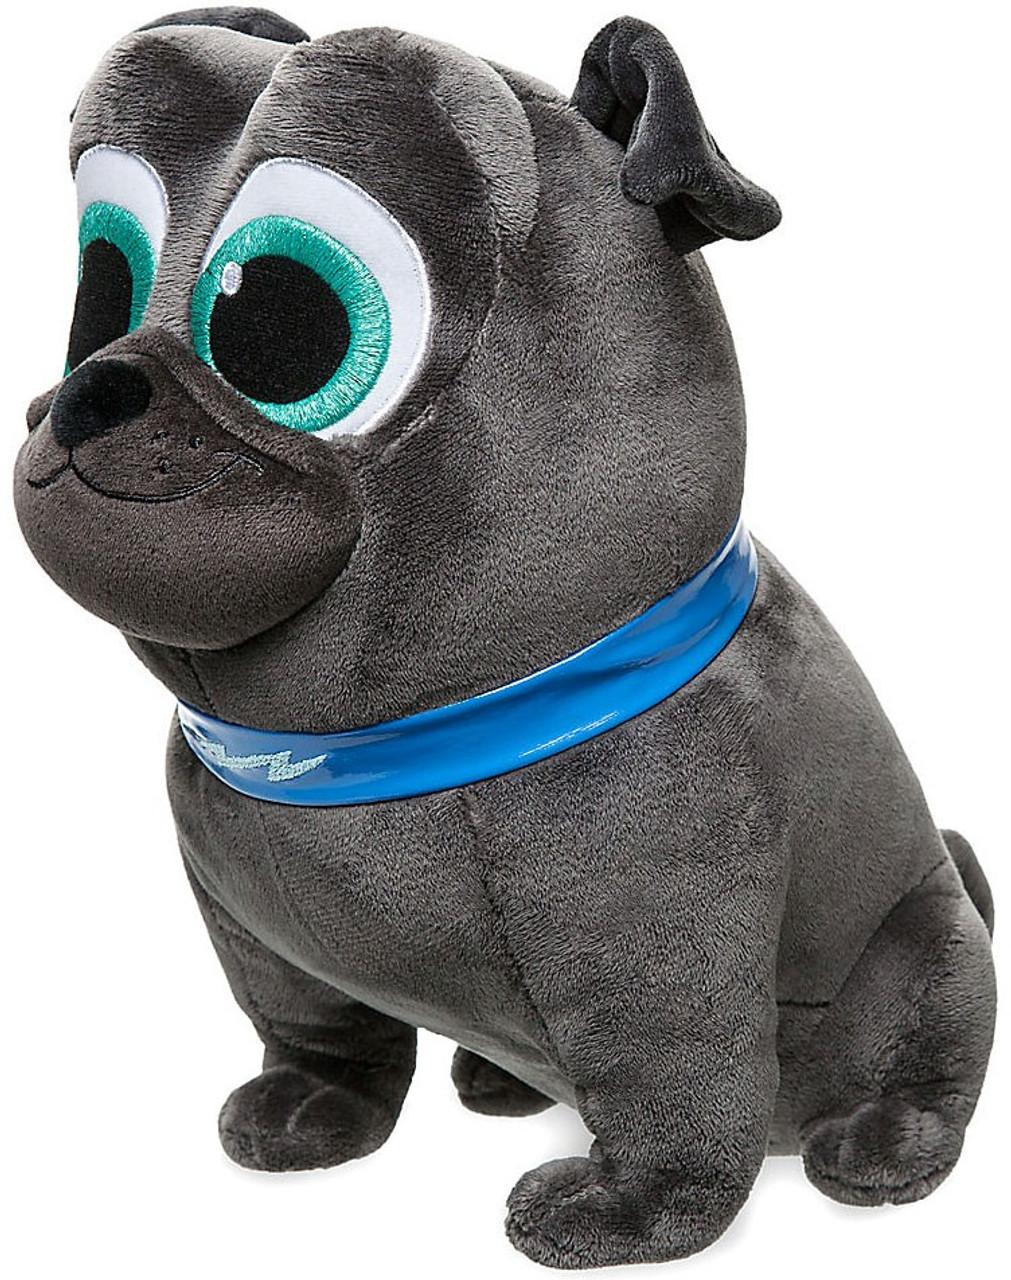 Puppy Dog Pals Plush Disney Exclusive Rolly Bingo Hissy Bundle